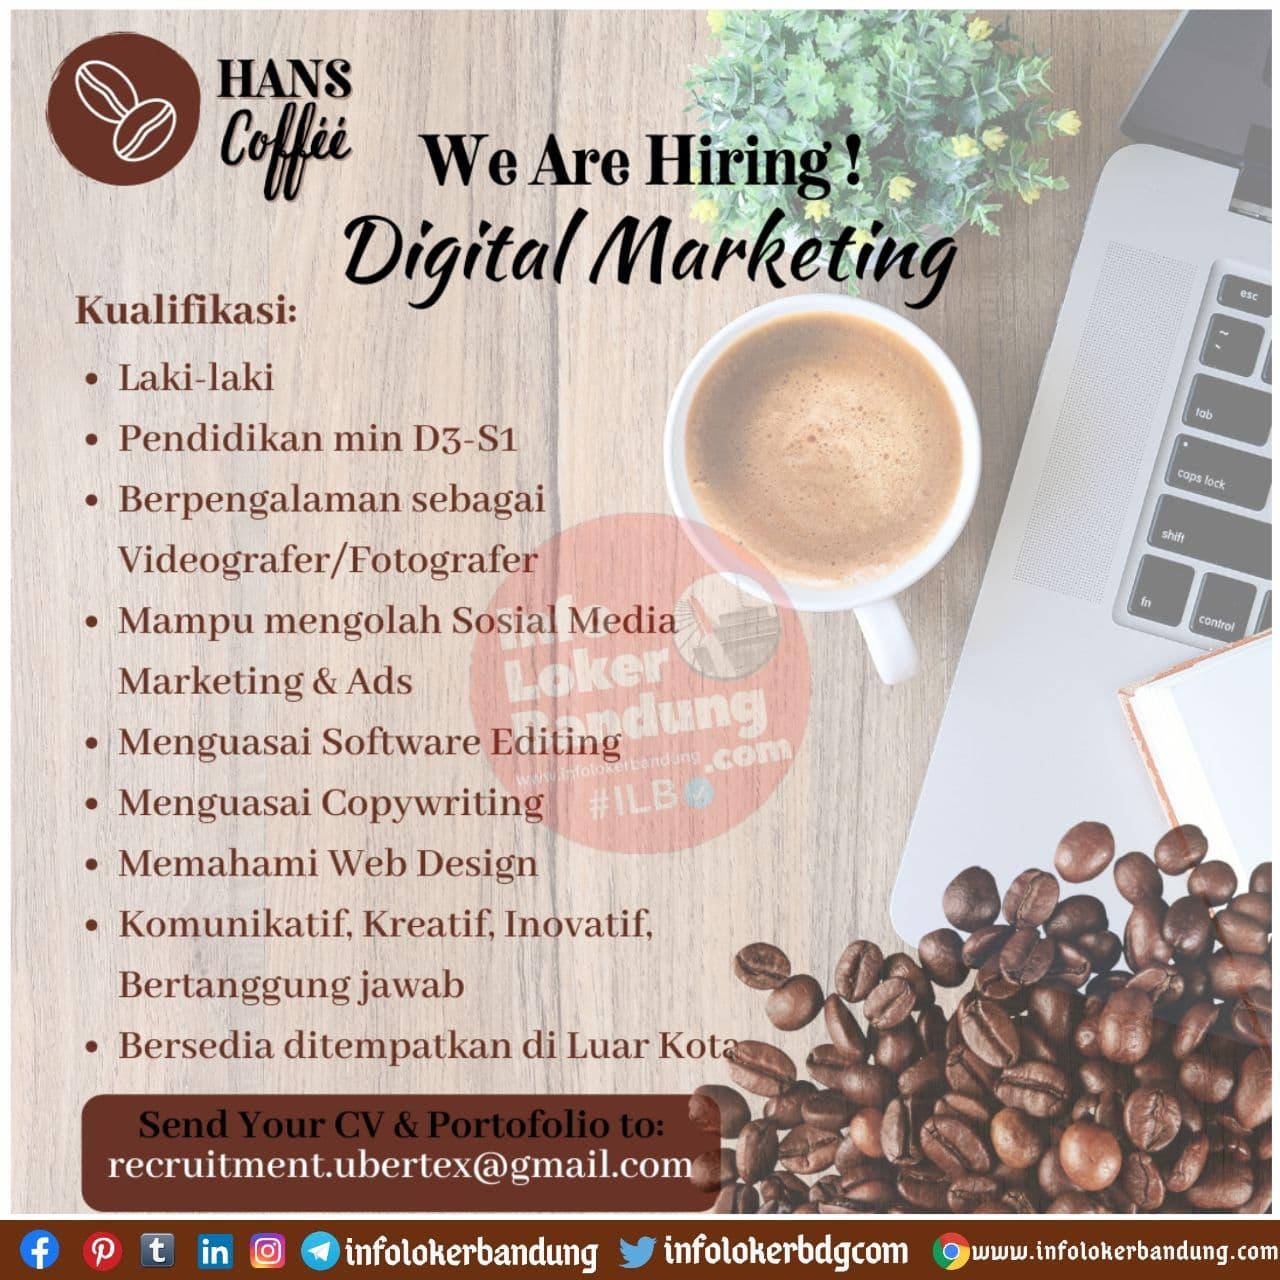 Lowongan Kerja Hans Coffee Bandung November 2020